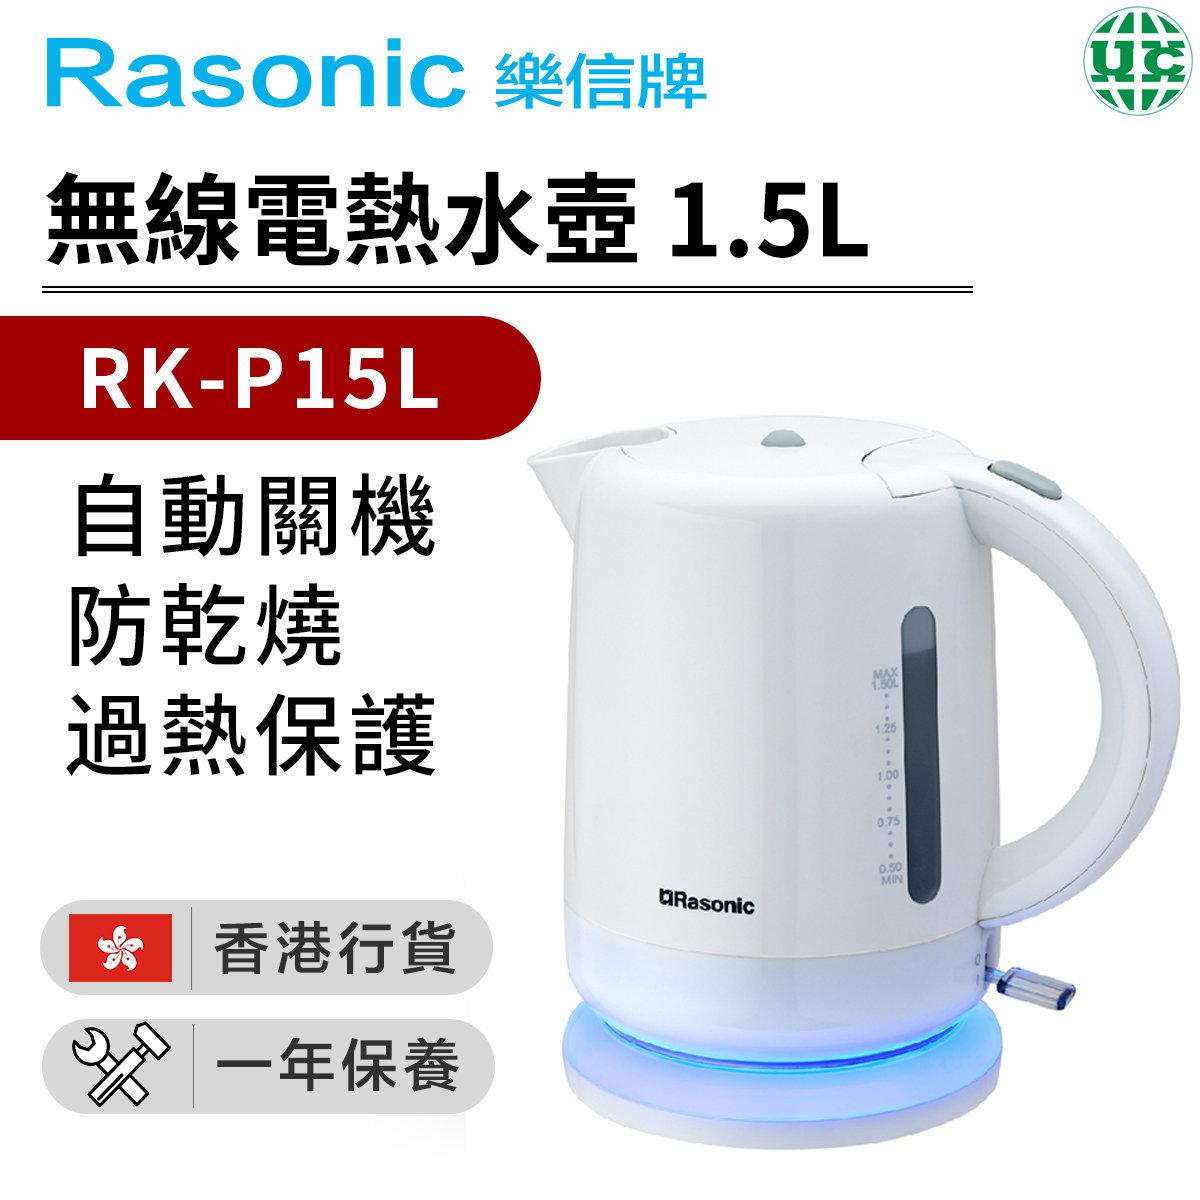 RK-P15L Radio Kettle 1.5L (Hong Kong licensed)